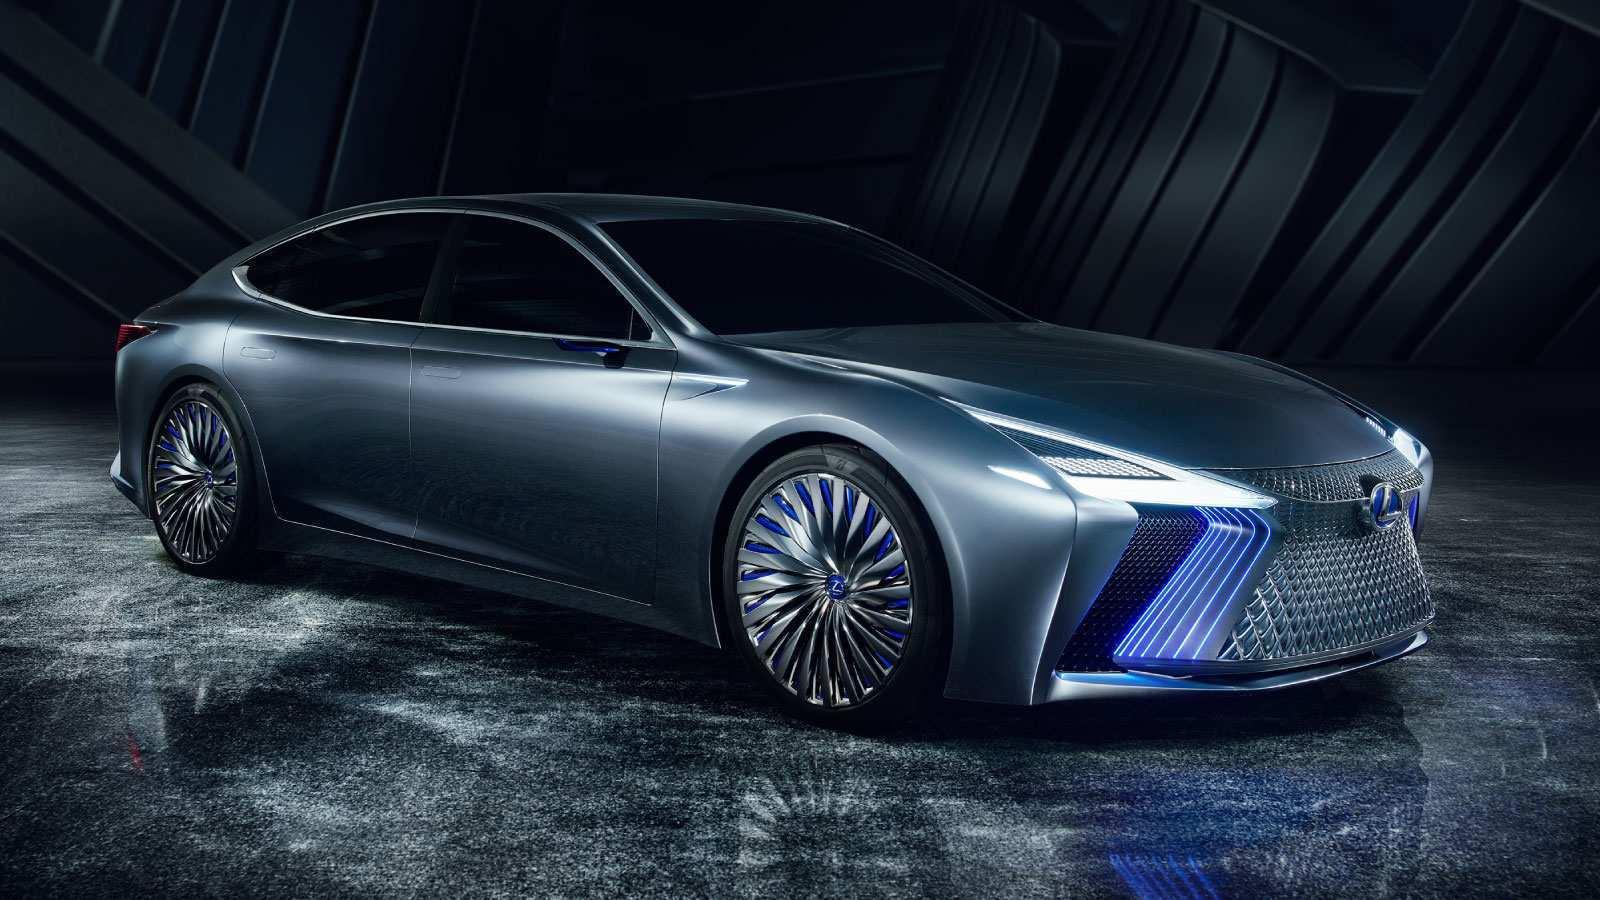 65 All New Ls Lexus 2020 Style by Ls Lexus 2020